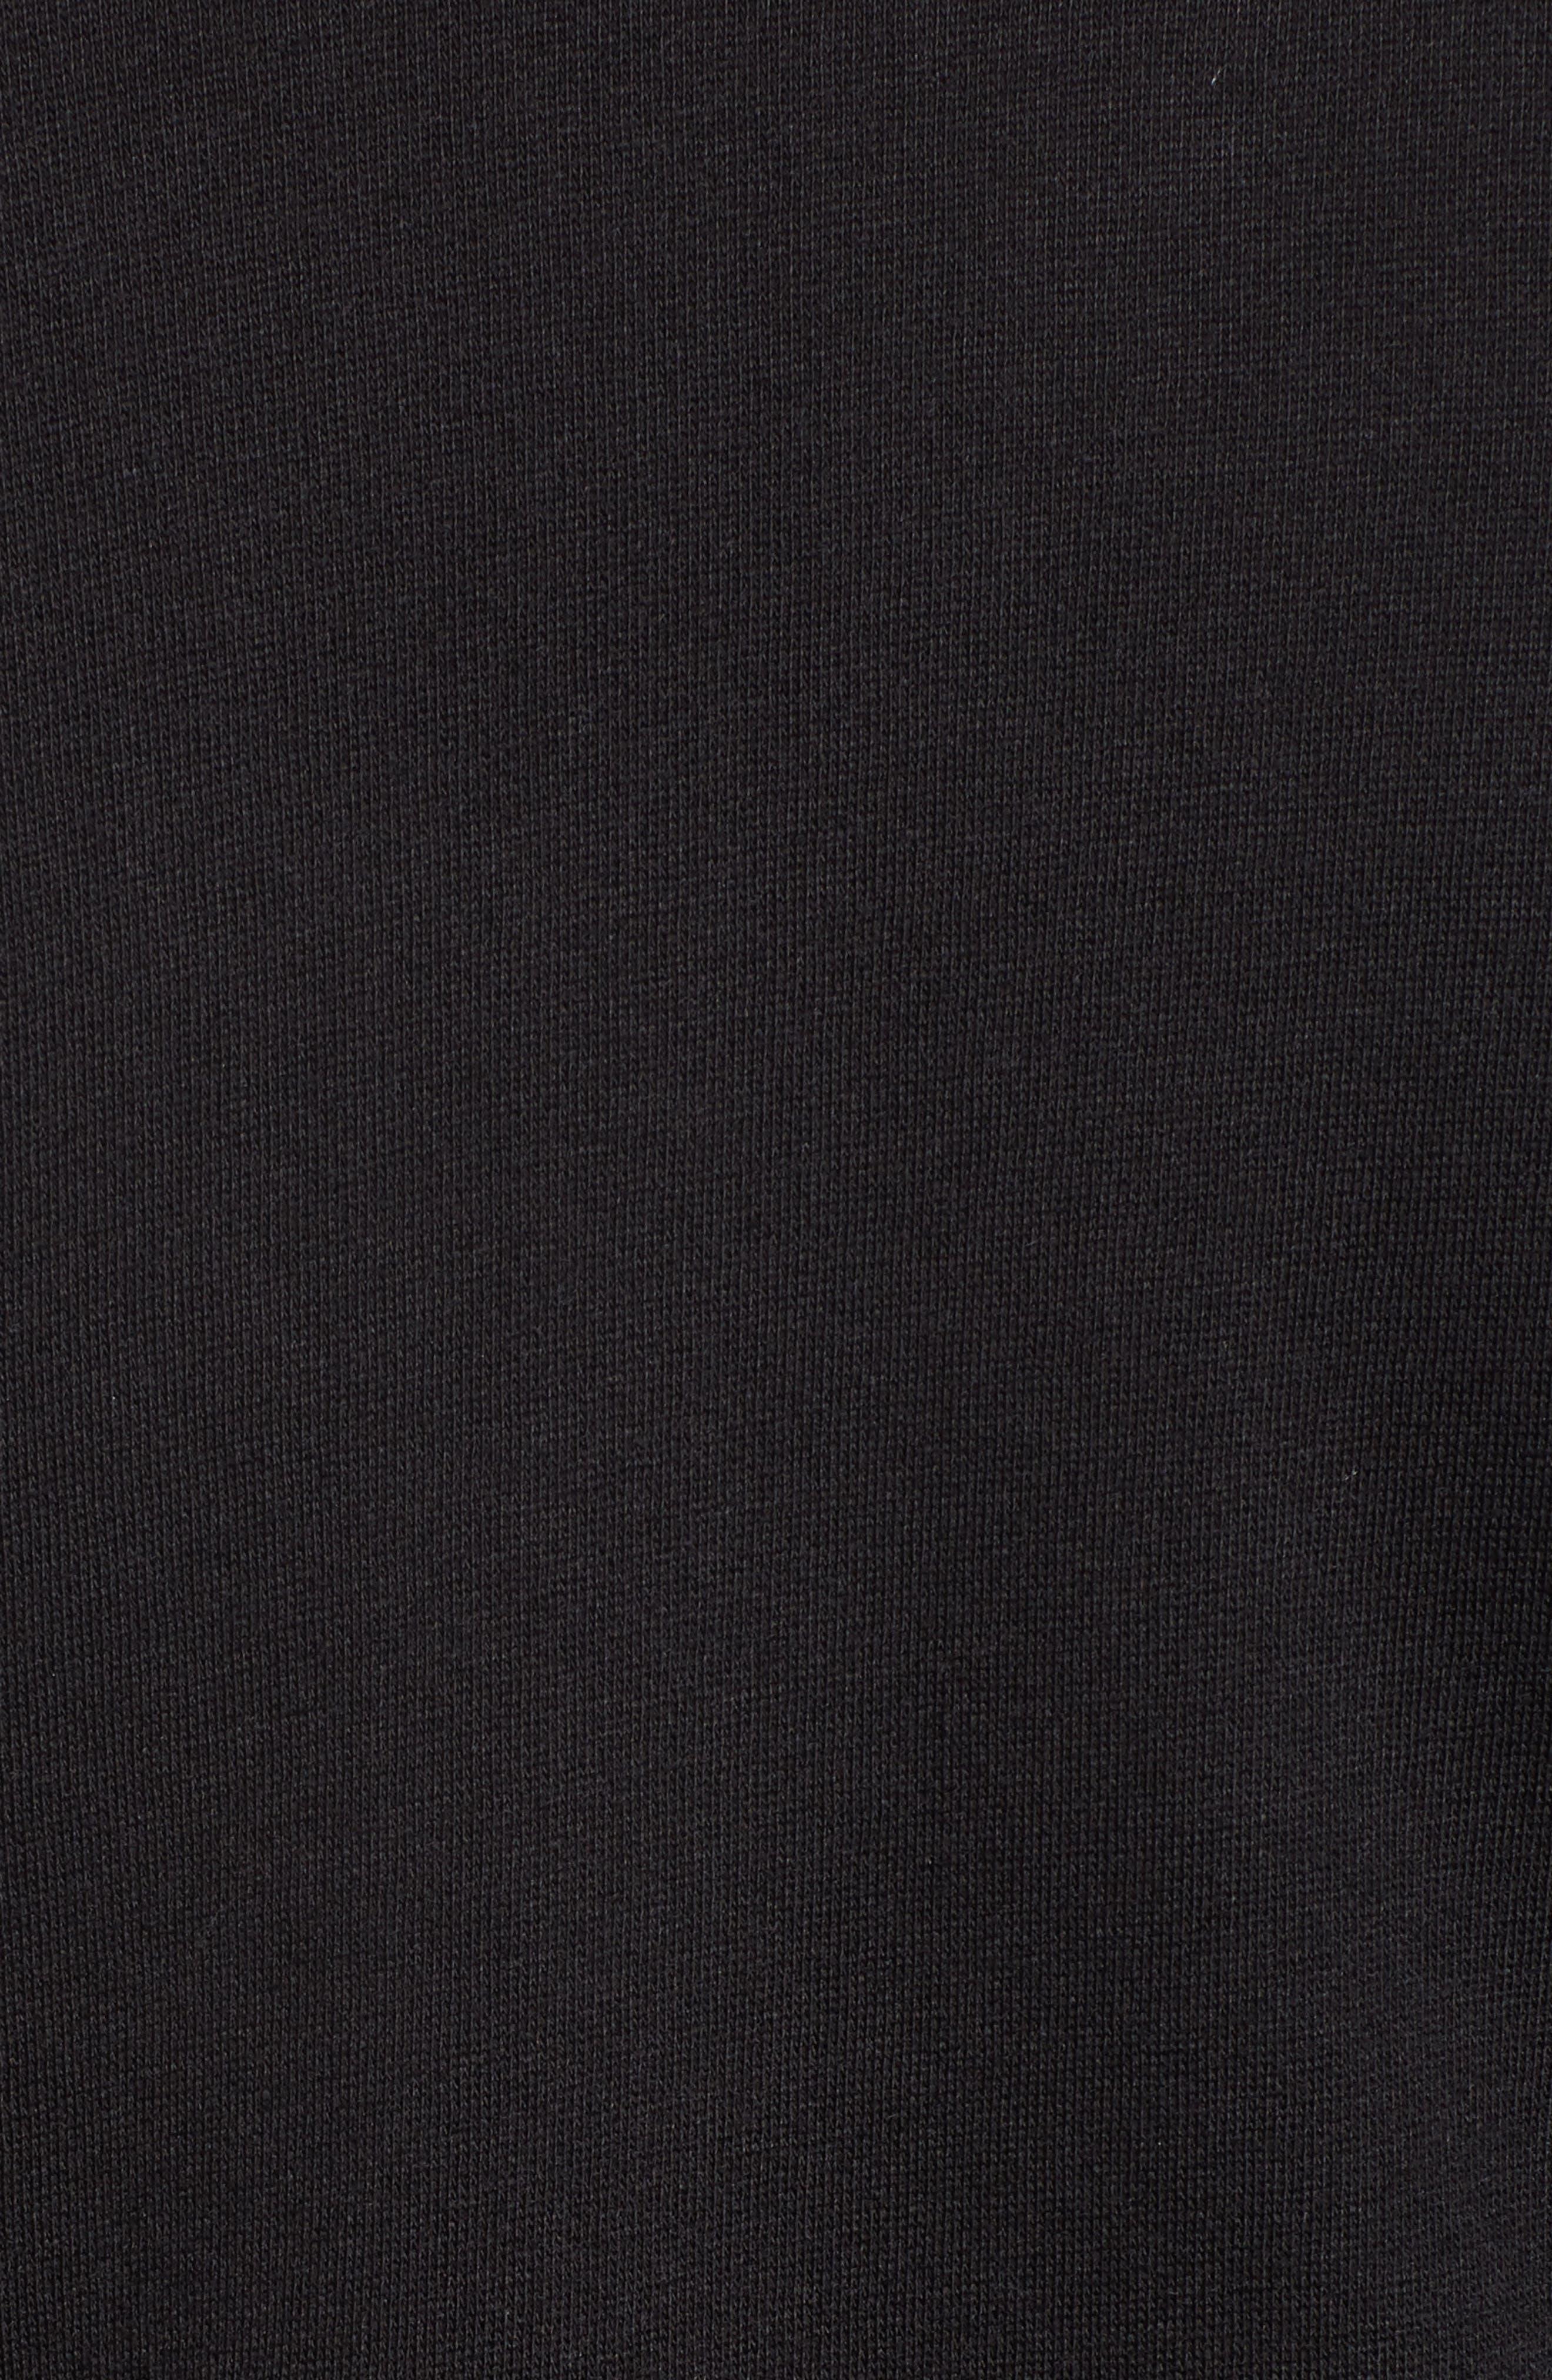 Two Pocket Knit Blazer,                             Alternate thumbnail 7, color,                             001